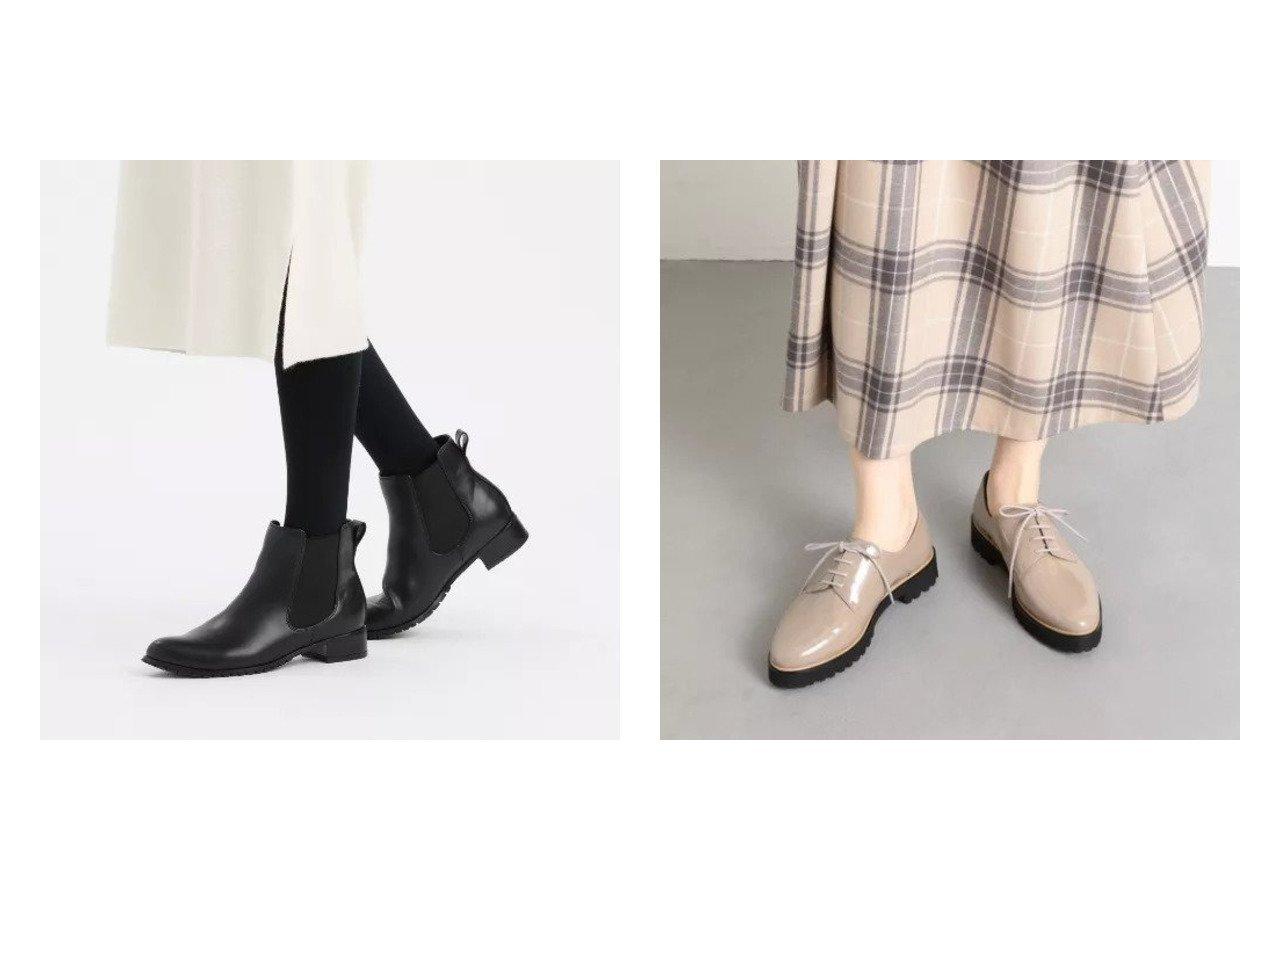 【MACKINTOSH PHILOSOPHY/マッキントッシュ フィロソフィー】のサイドゴアレインブーツ&【Odette e Odile/オデット エ オディール】の【WEB限定】O レースアップ FLT35●↑ シューズ・靴のおすすめ!人気、レディースファッションの通販 おすすめで人気のファッション通販商品 インテリア・家具・キッズファッション・メンズファッション・レディースファッション・服の通販 founy(ファニー) https://founy.com/ ファッション Fashion レディース WOMEN ガラス シューズ シンプル スタイリッシュ フラット 人気 クラシカル ソックス タイツ マニッシュ レース  ID:crp329100000001582